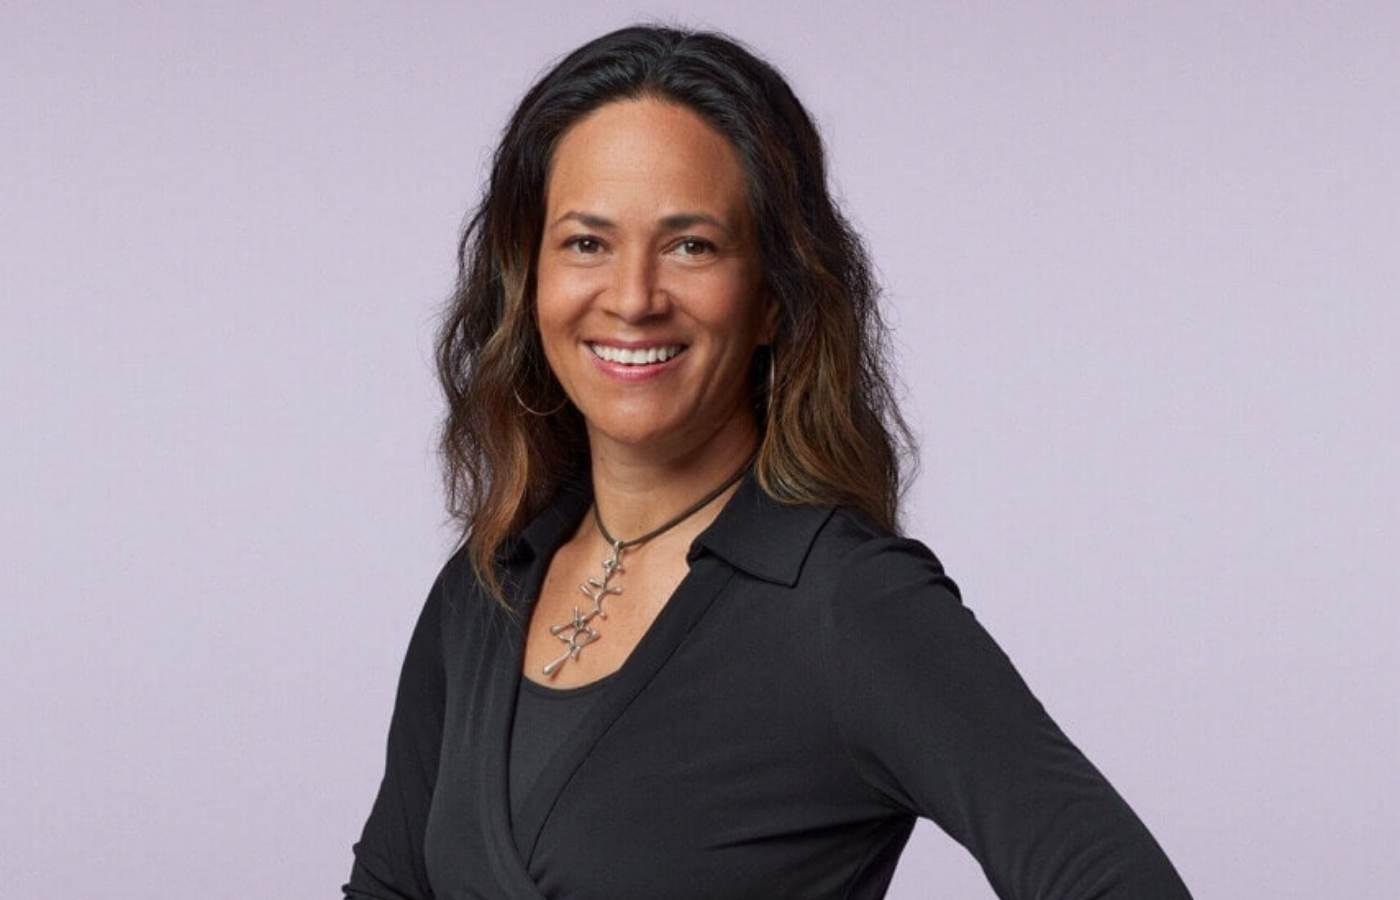 TAO Member Spotlight: Kate Winkler